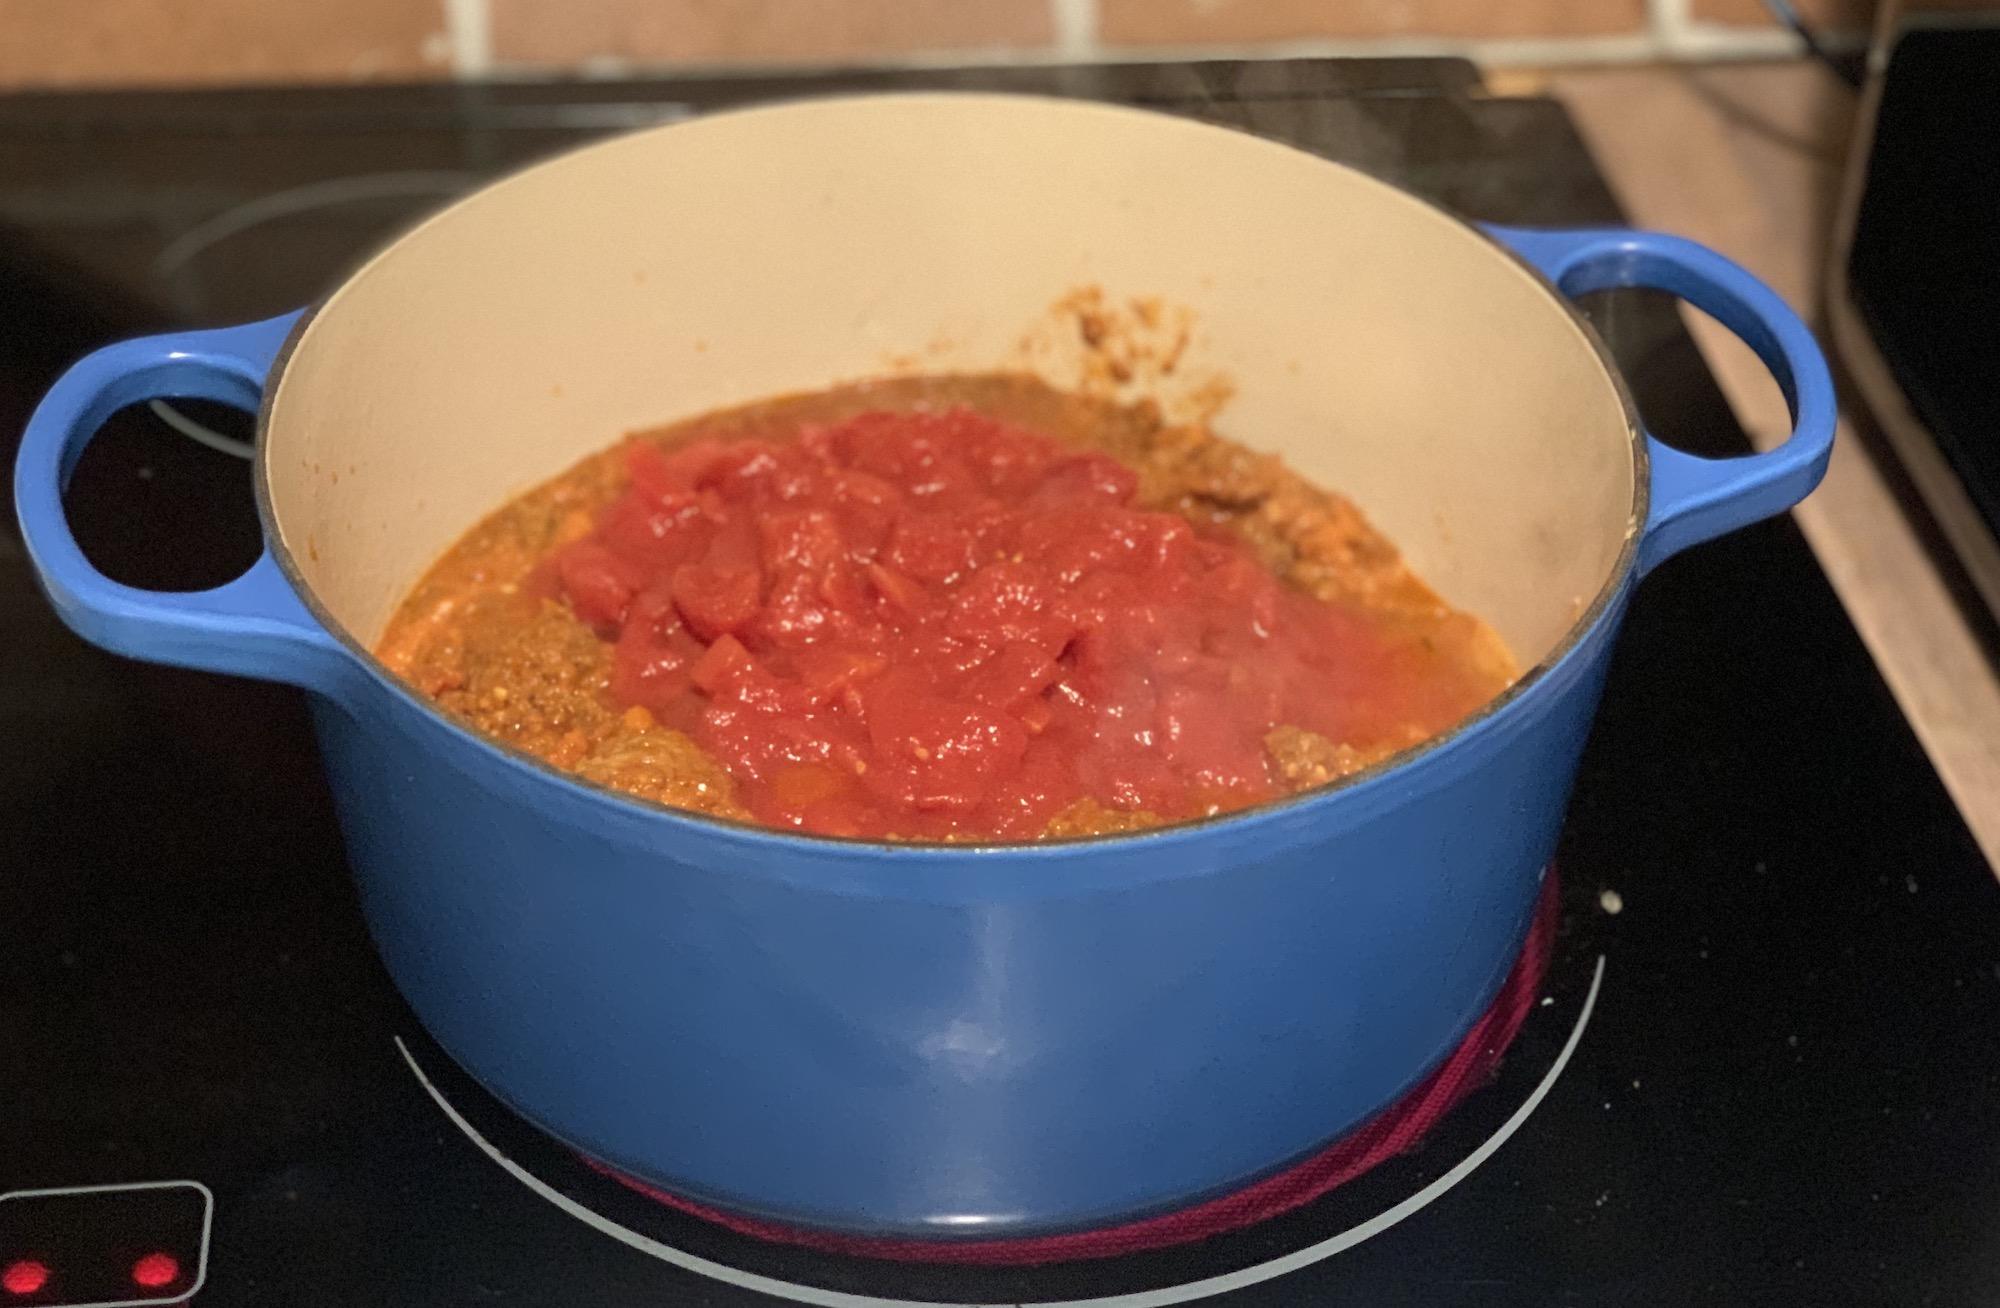 Spaghetti sauce dutch oven